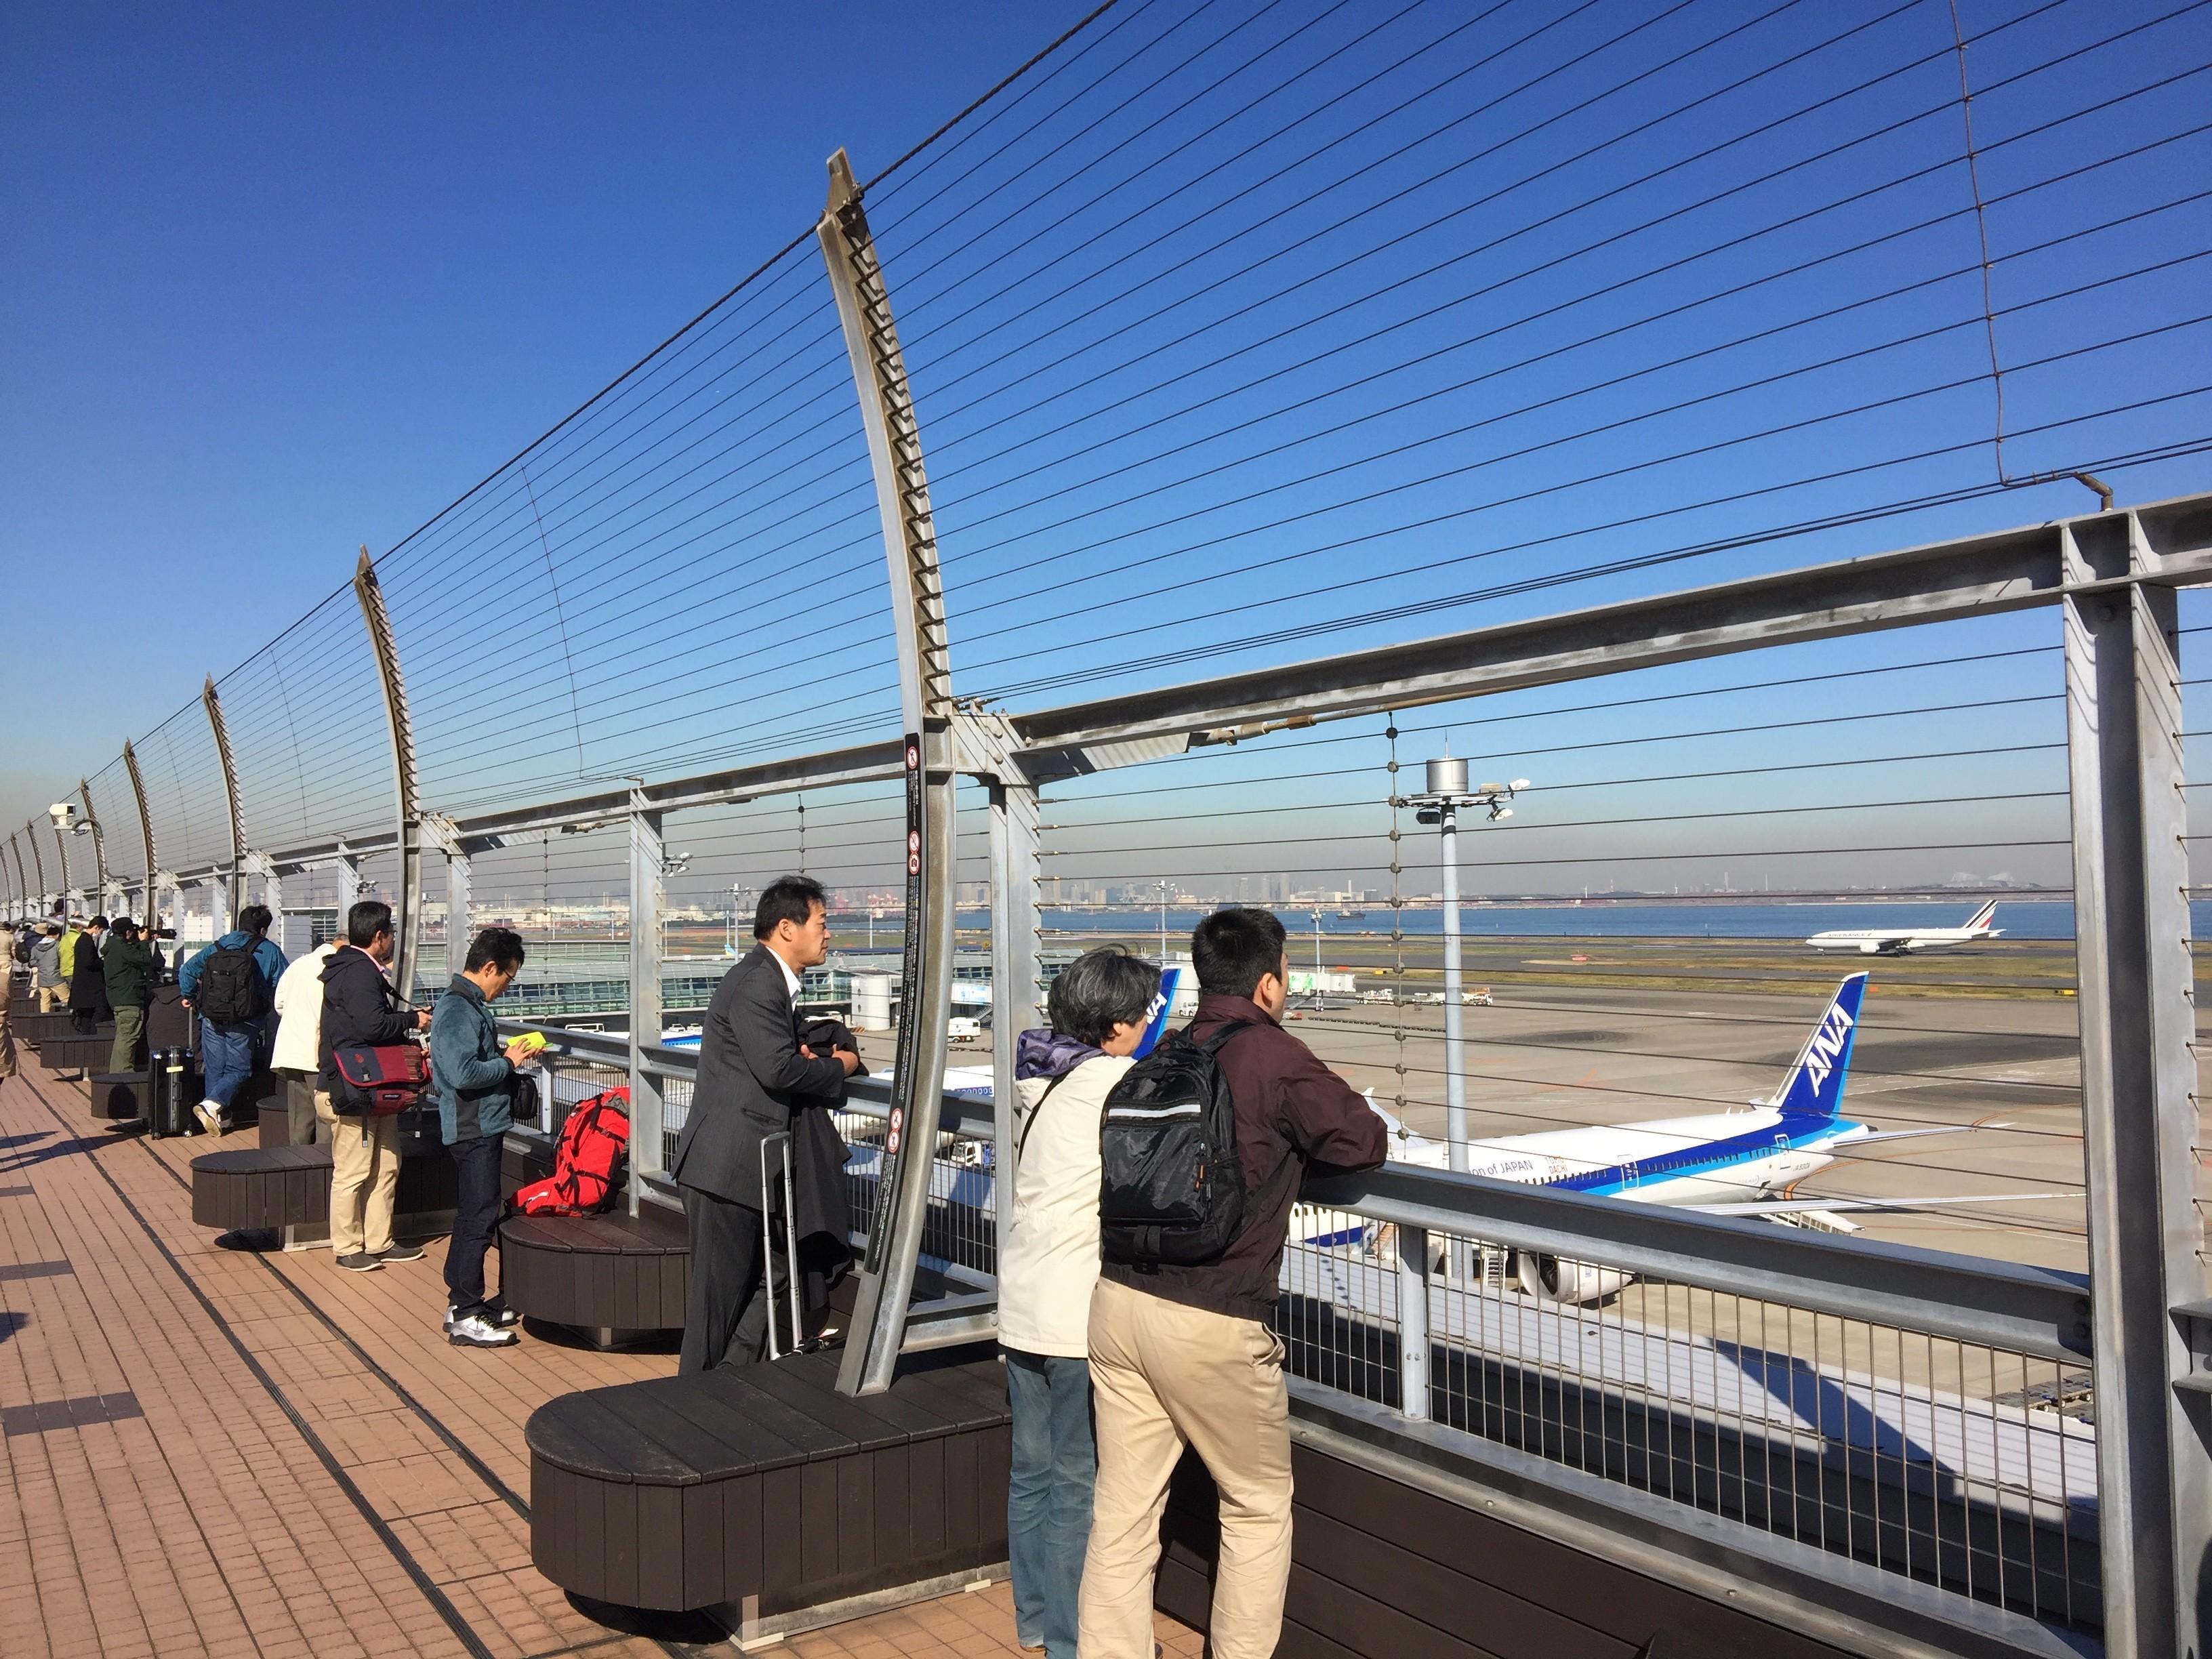 Tokyo Haneda airport spotting report by Henry Tenby